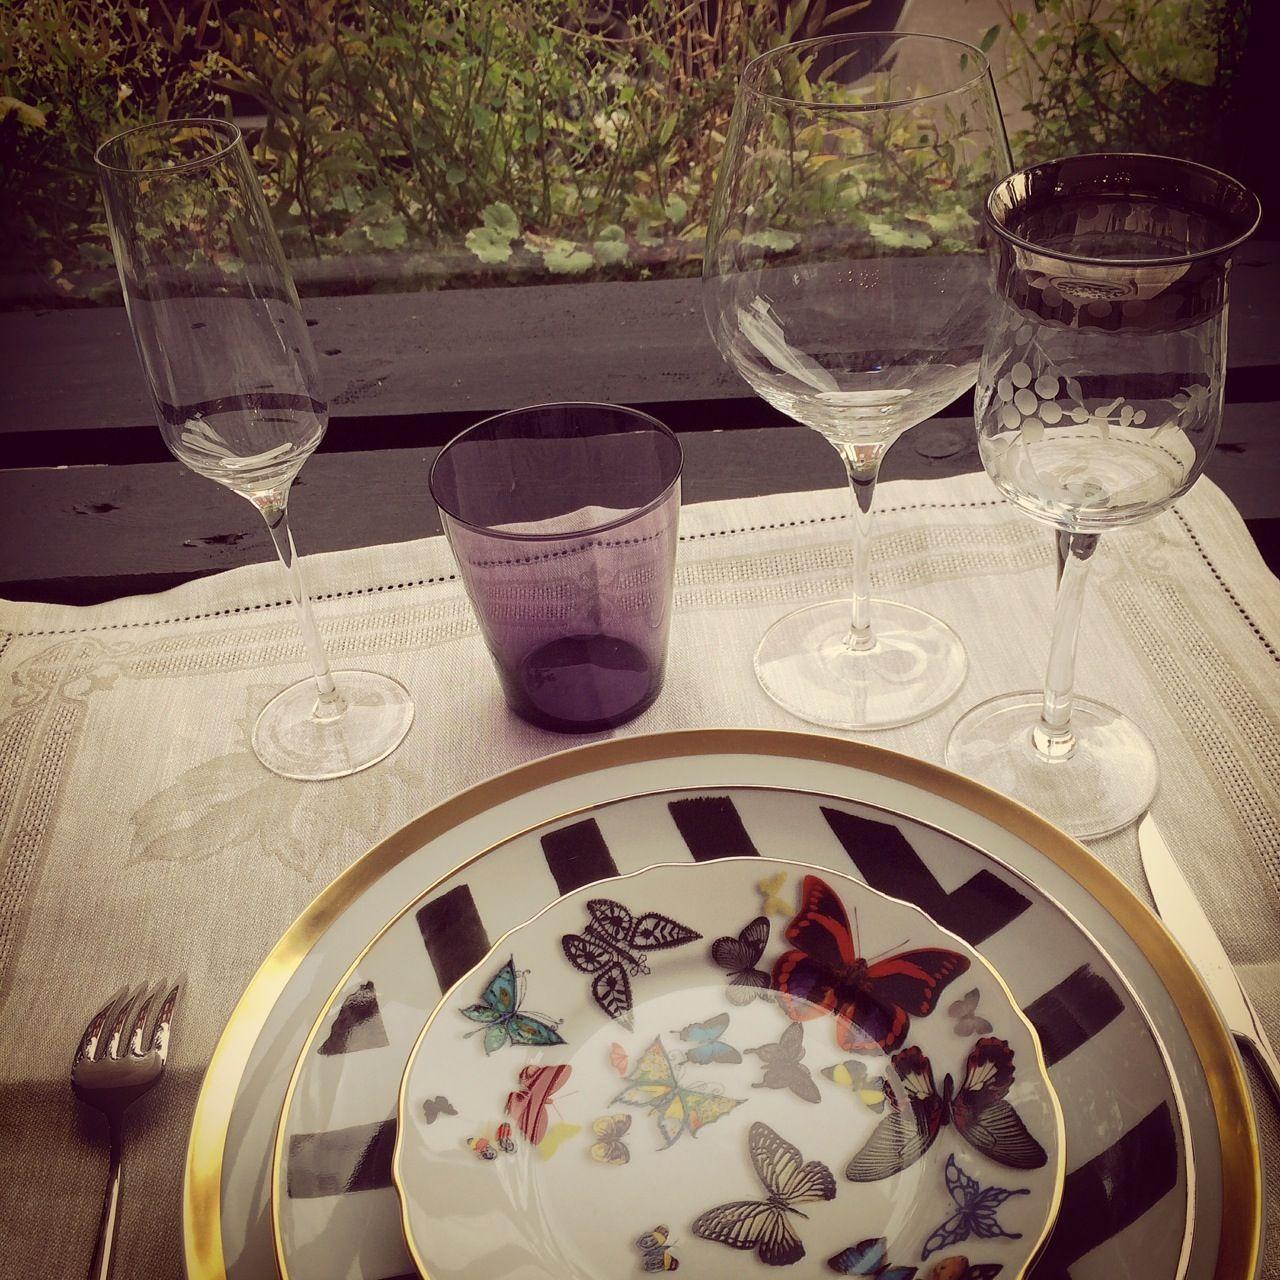 art de la table disposition des verres 3 femmes 1 coussin inspirations art de la table. Black Bedroom Furniture Sets. Home Design Ideas